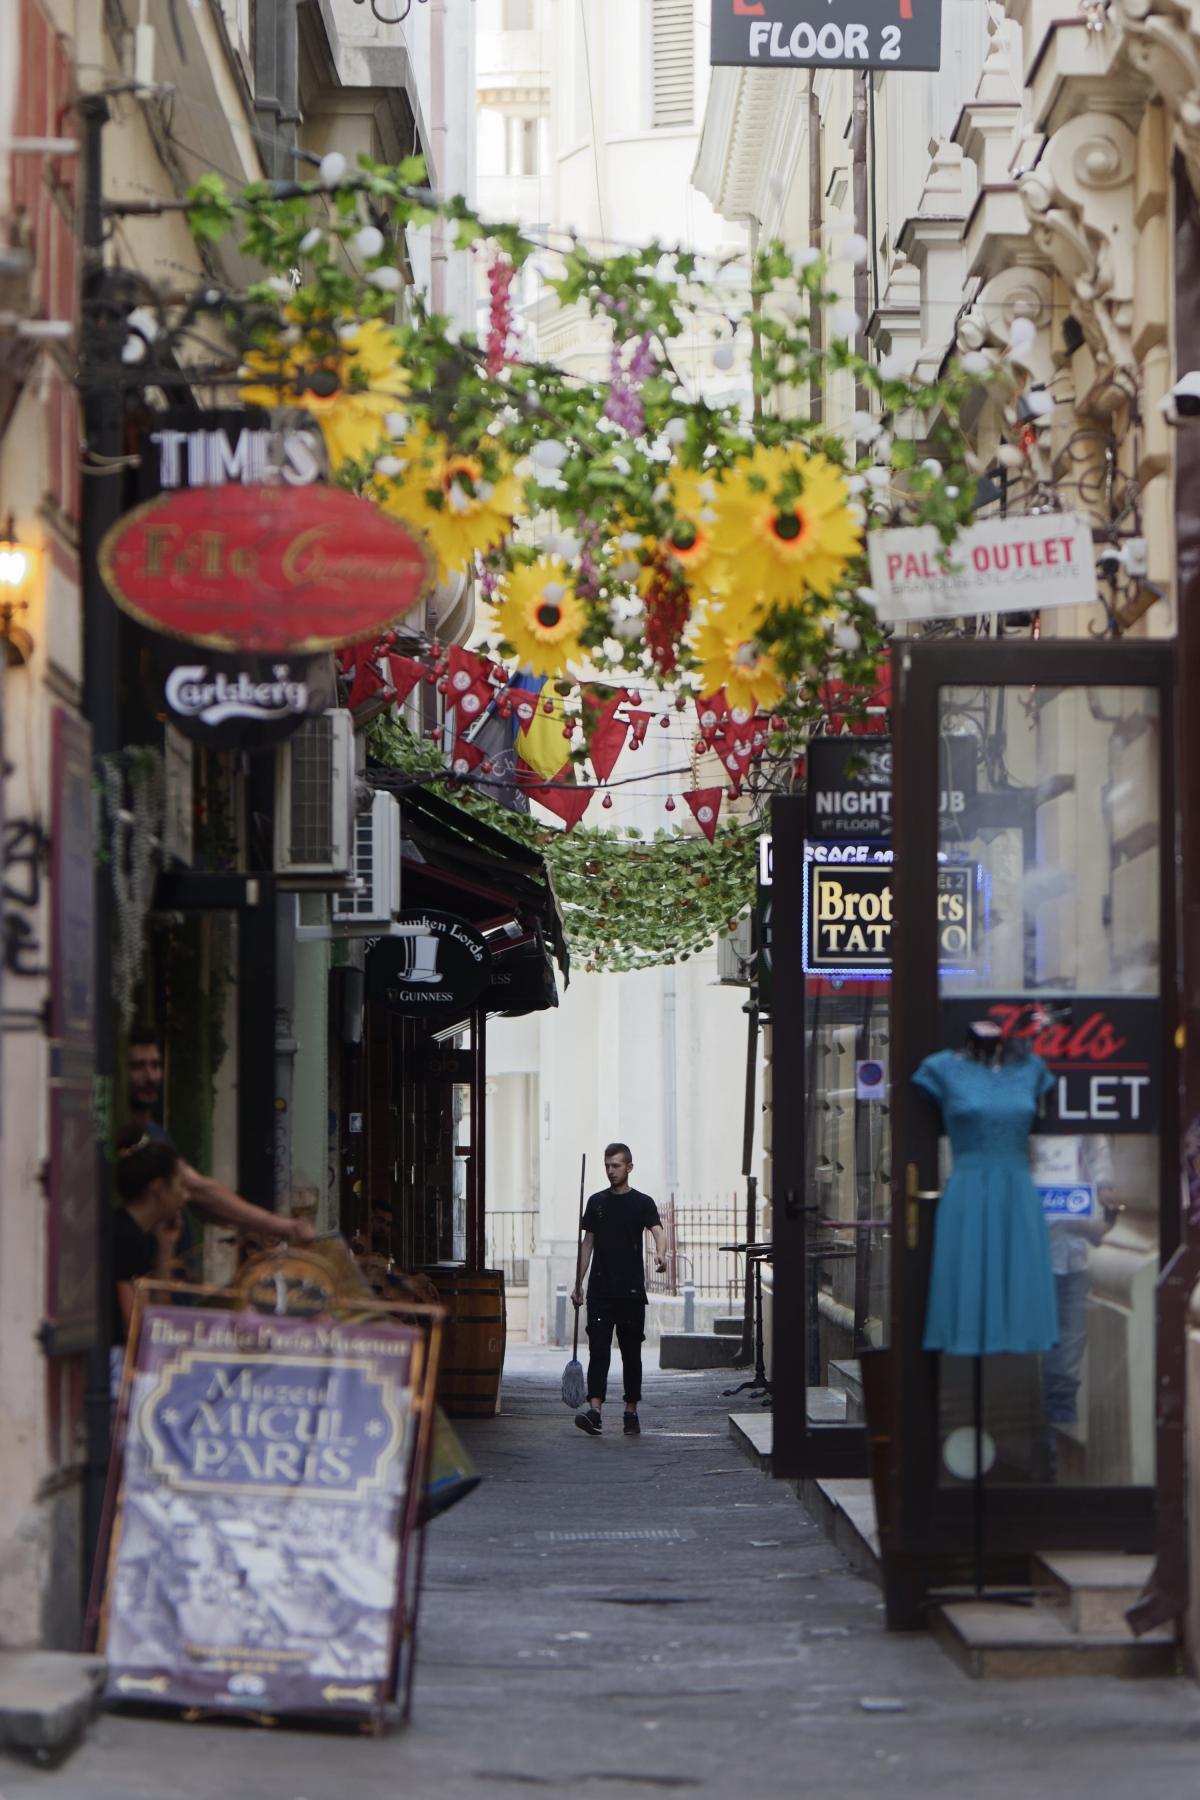 Man Walking Between the Alley